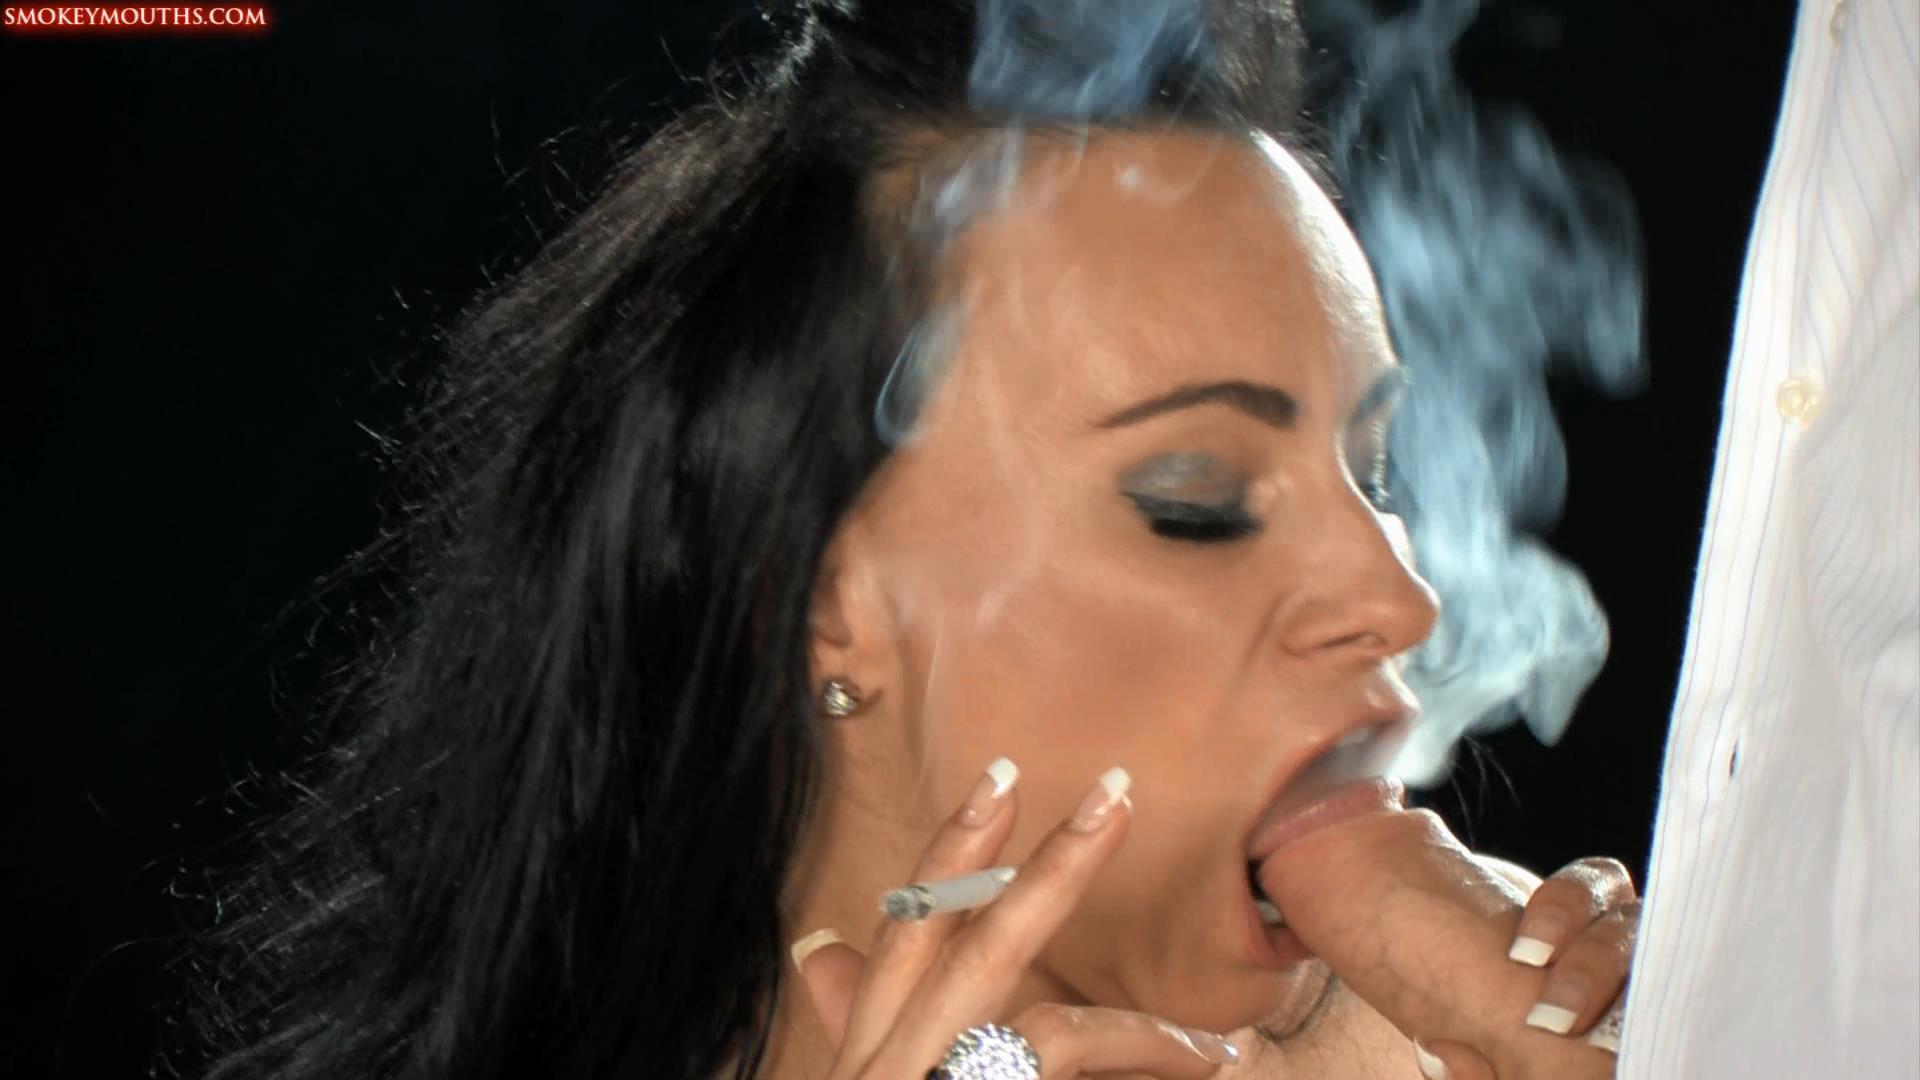 image Full smoking fetish scene glamsmoke scene 6